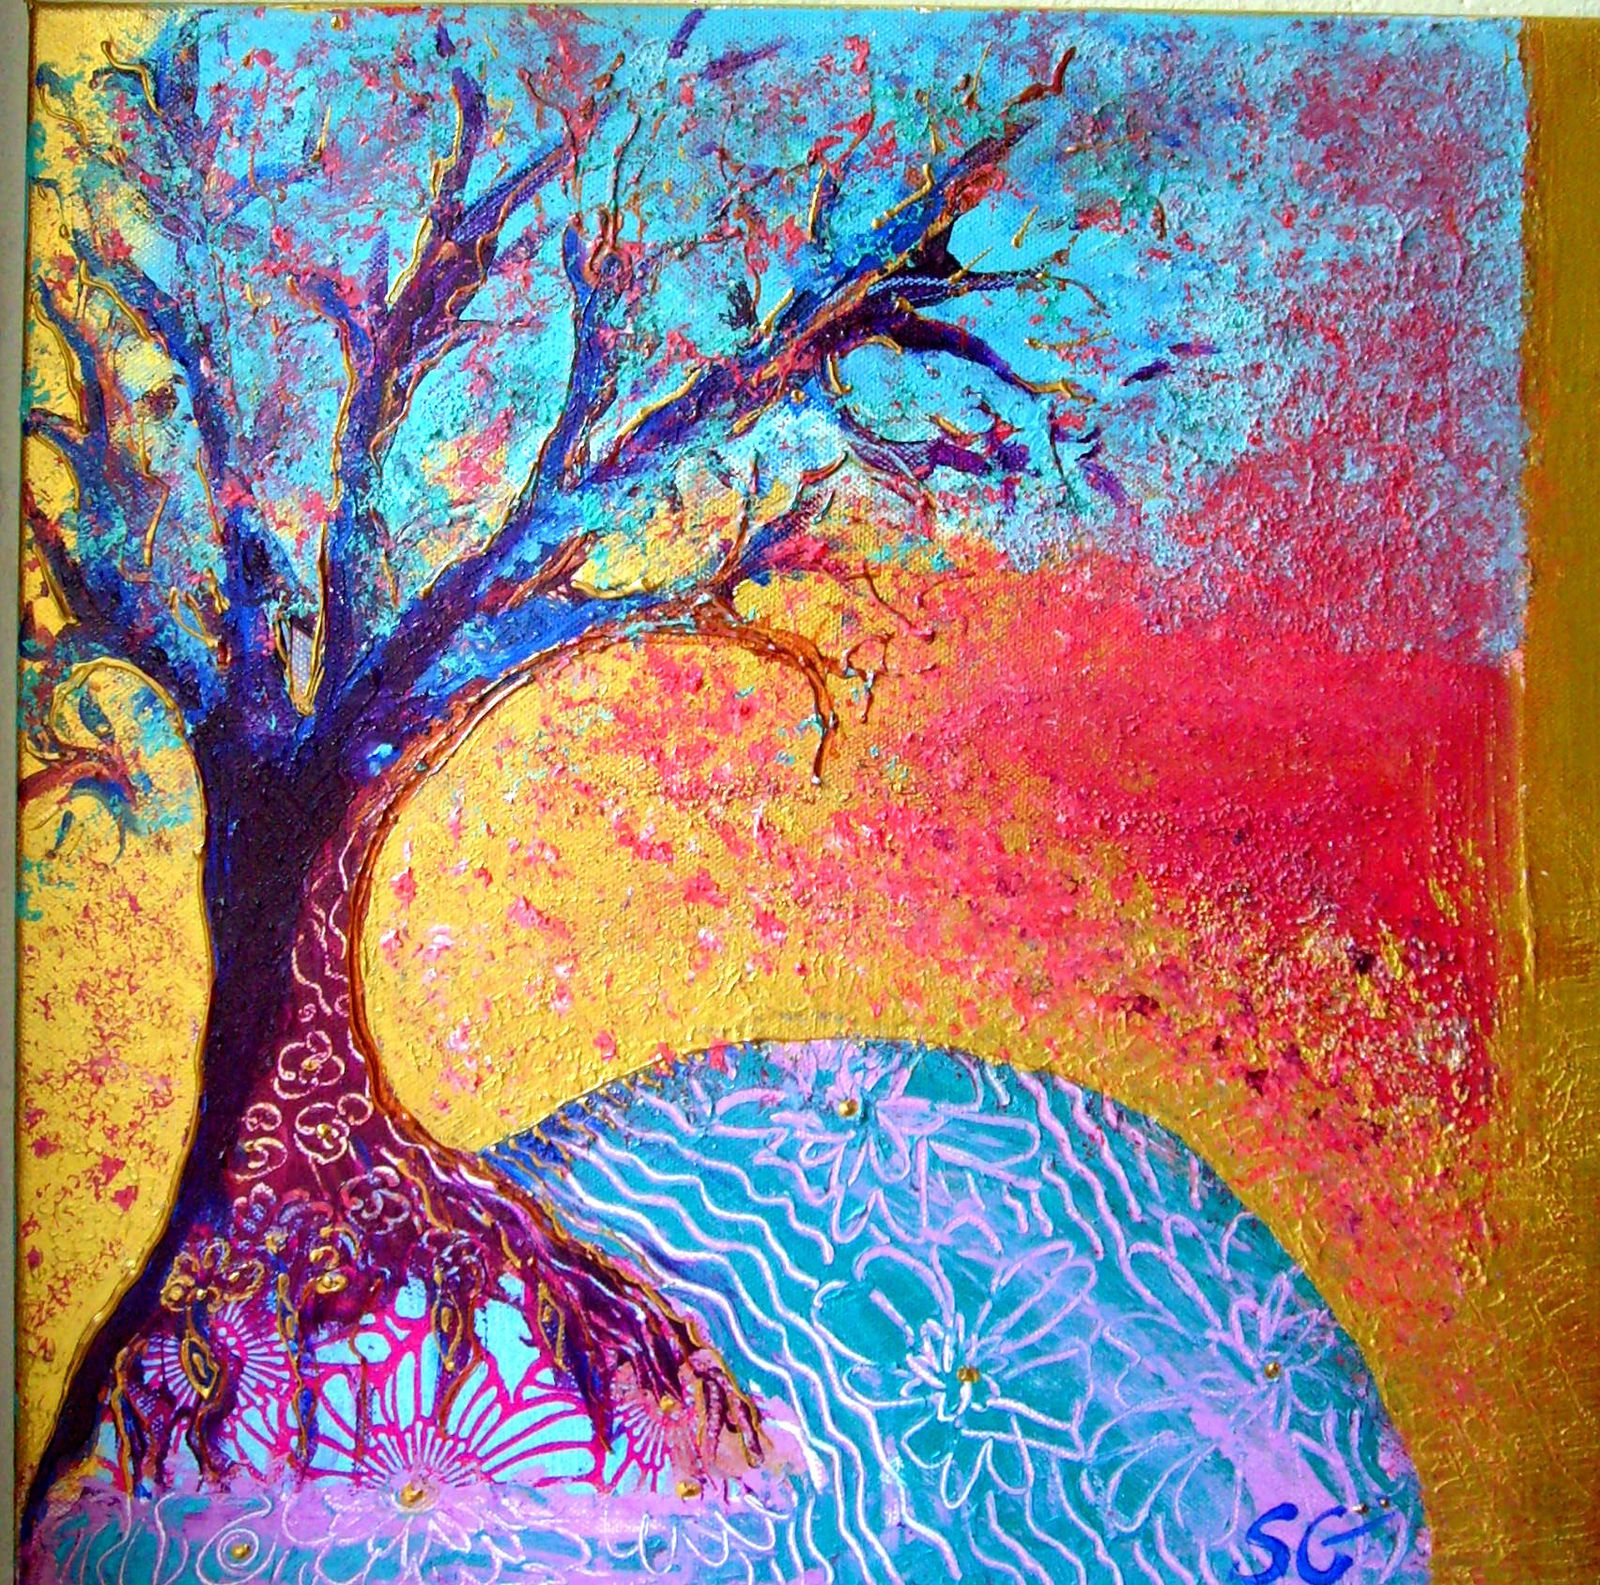 Arbre de vie/Ağaç-I Hayat